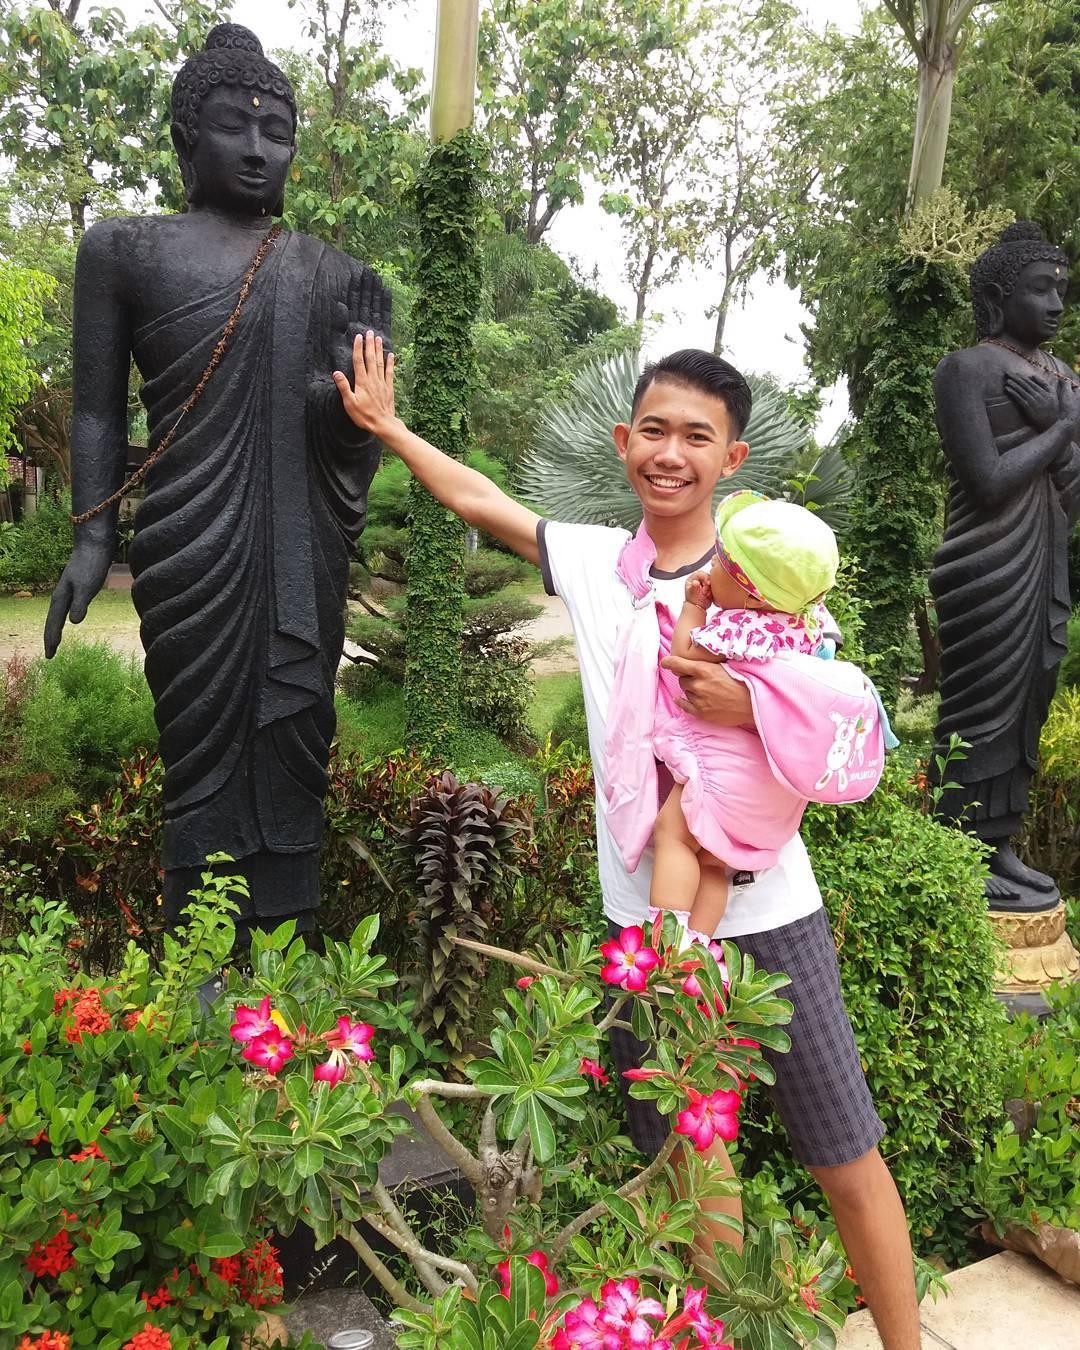 Patung Budha Tidur Mojokerto Tempat Wisata Pulau Jawa Tos Sama